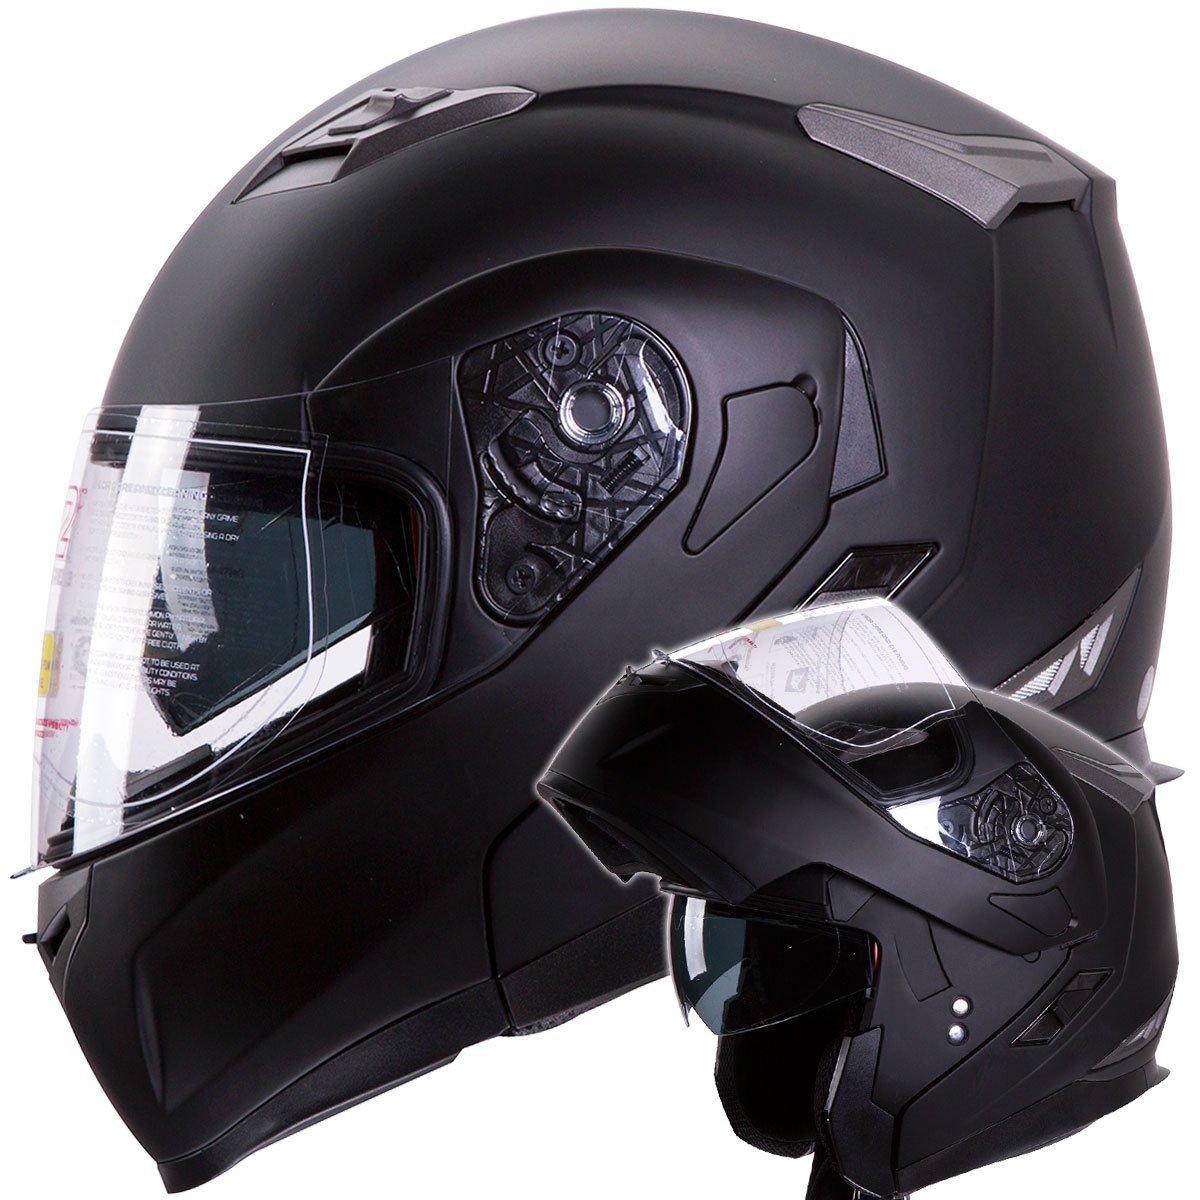 5. Motorcycle /Snowmobile Matte Black Dual Black Dual Visor Modular Helmet